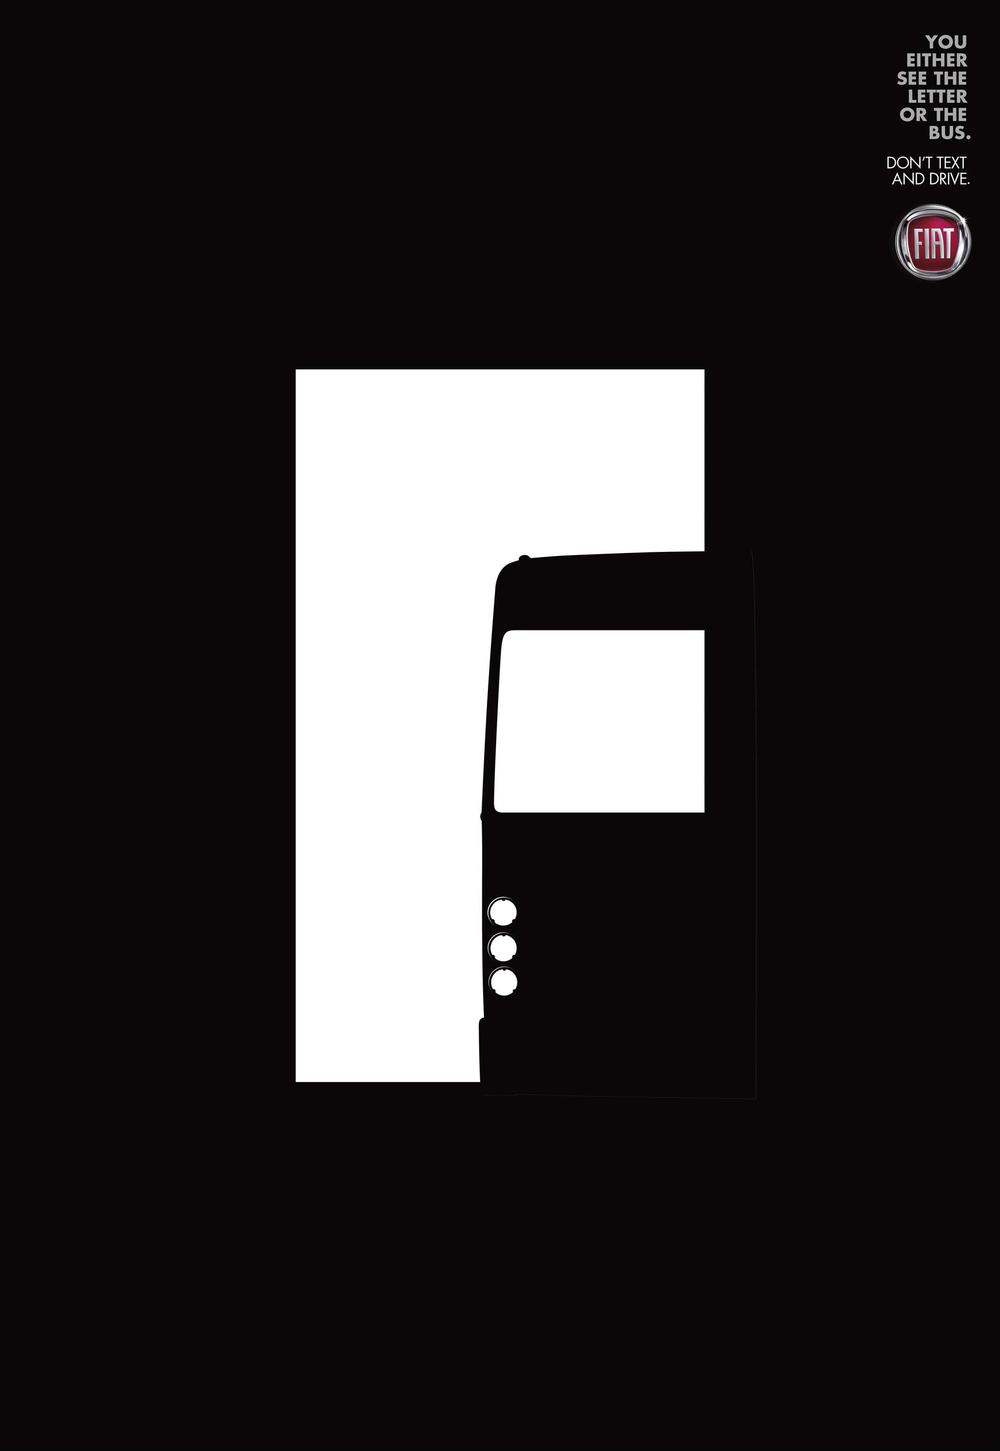 fiat_f_bus.jpg